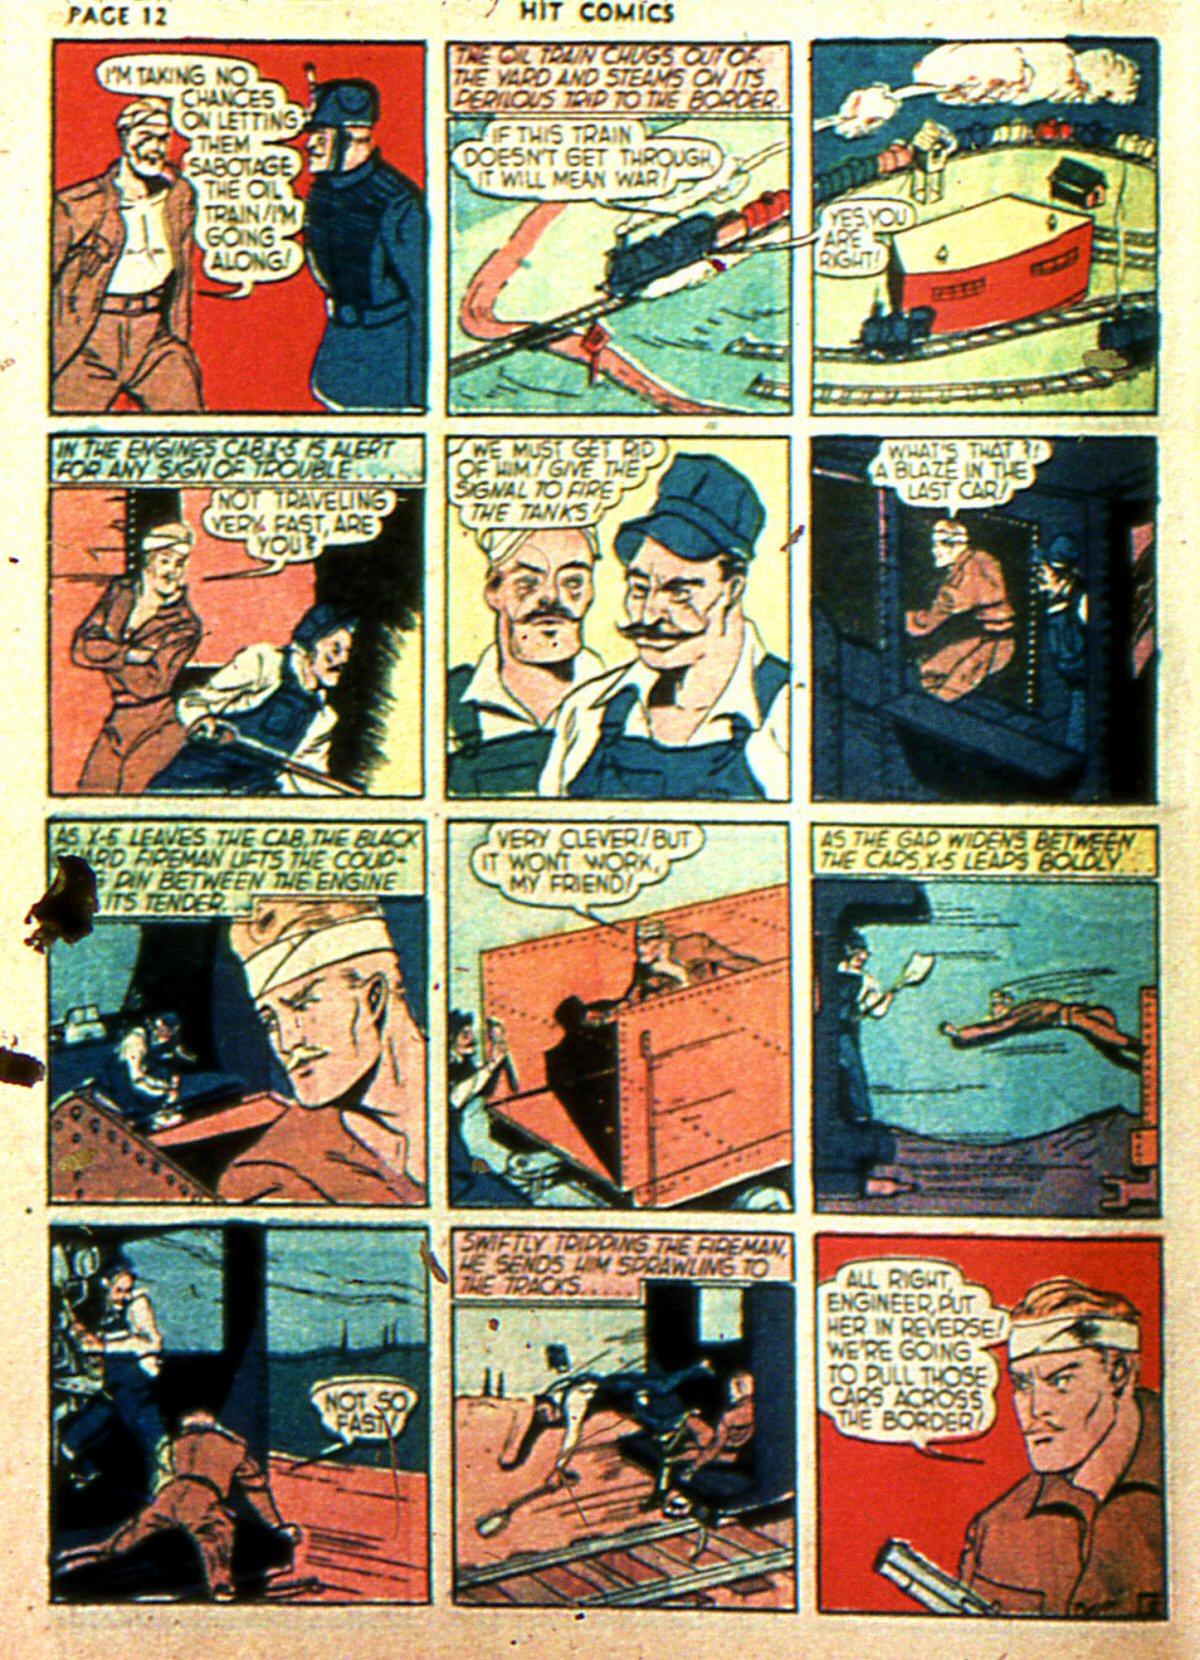 Read online Hit Comics comic -  Issue #2 - 14